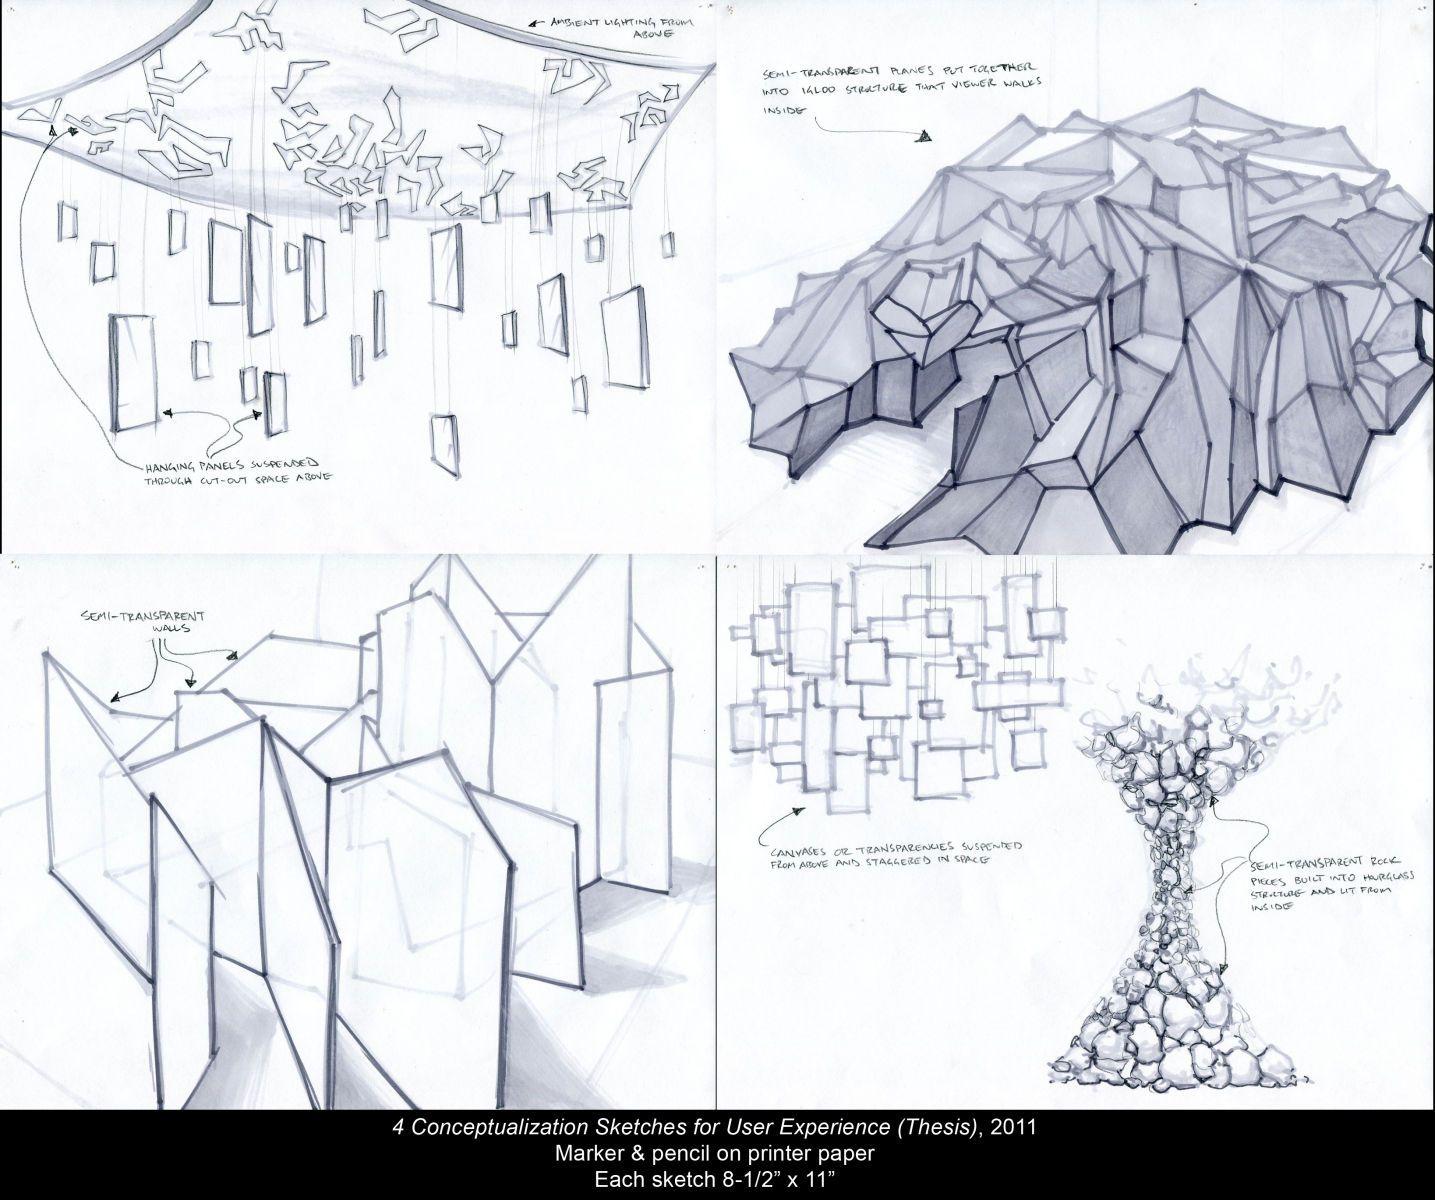 1marker_sketches_w_text.jpg